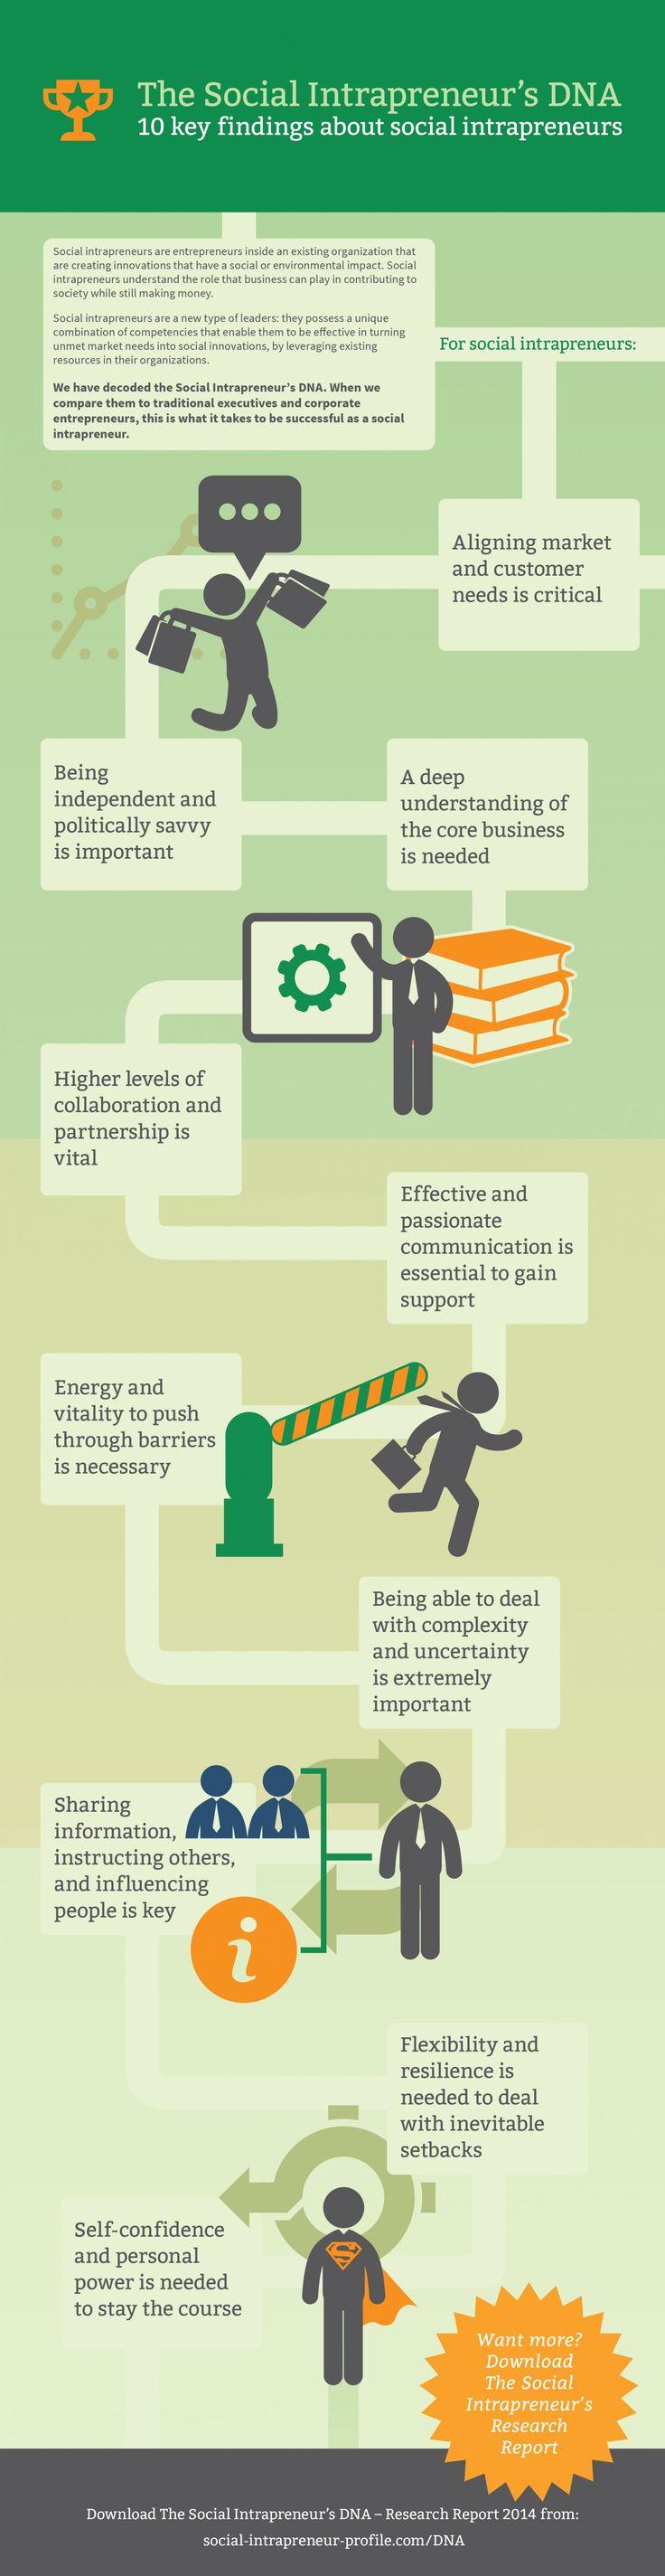 Social Media  >> The Social Intrapreneur's DNA #infographic - Business ...